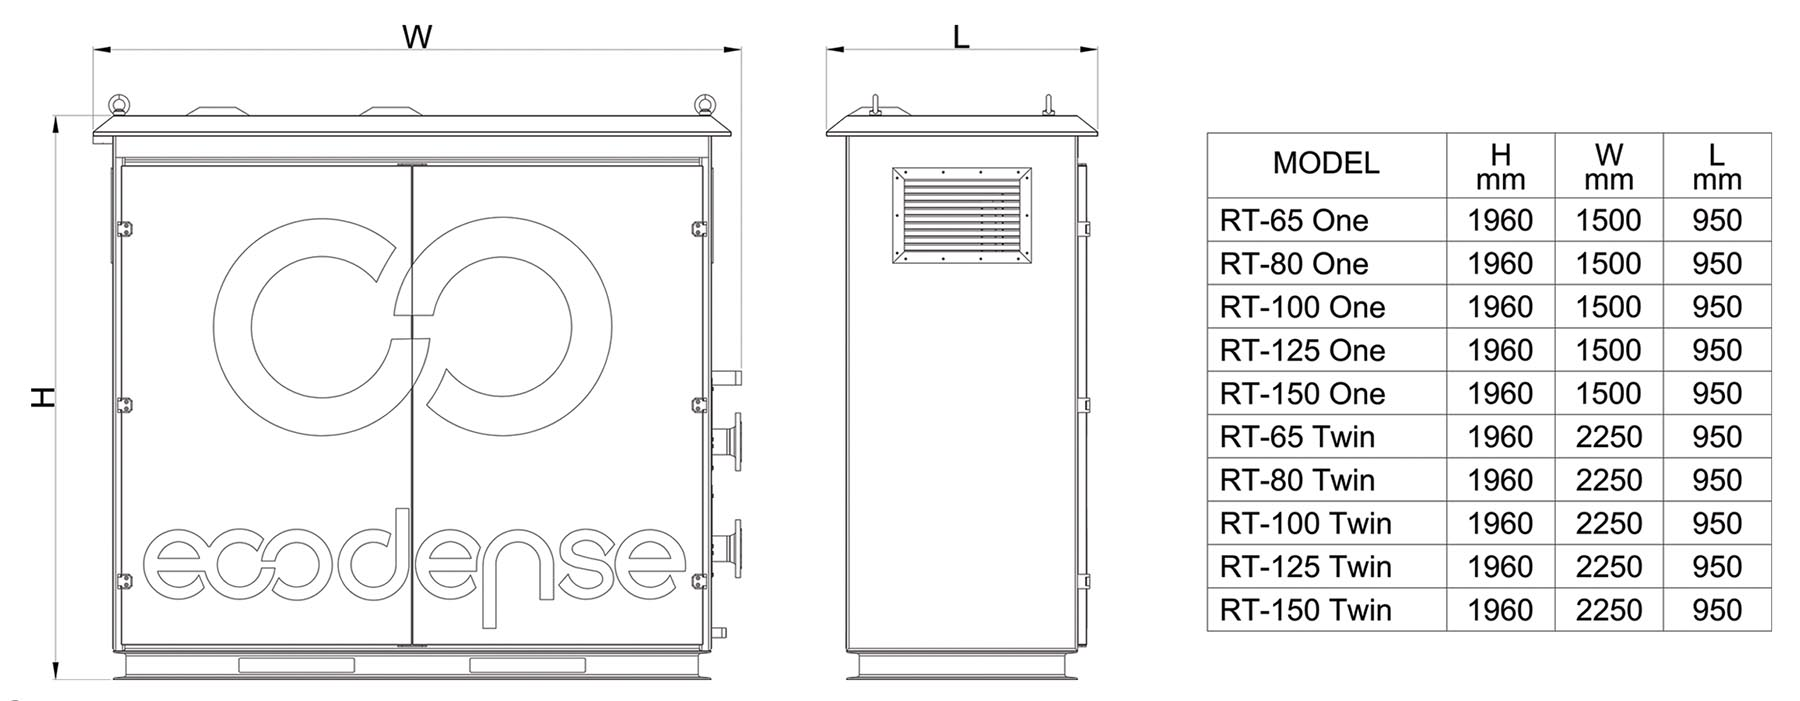 Large External Floor Standing Gas Condensing Boilers Dimensions RT Series